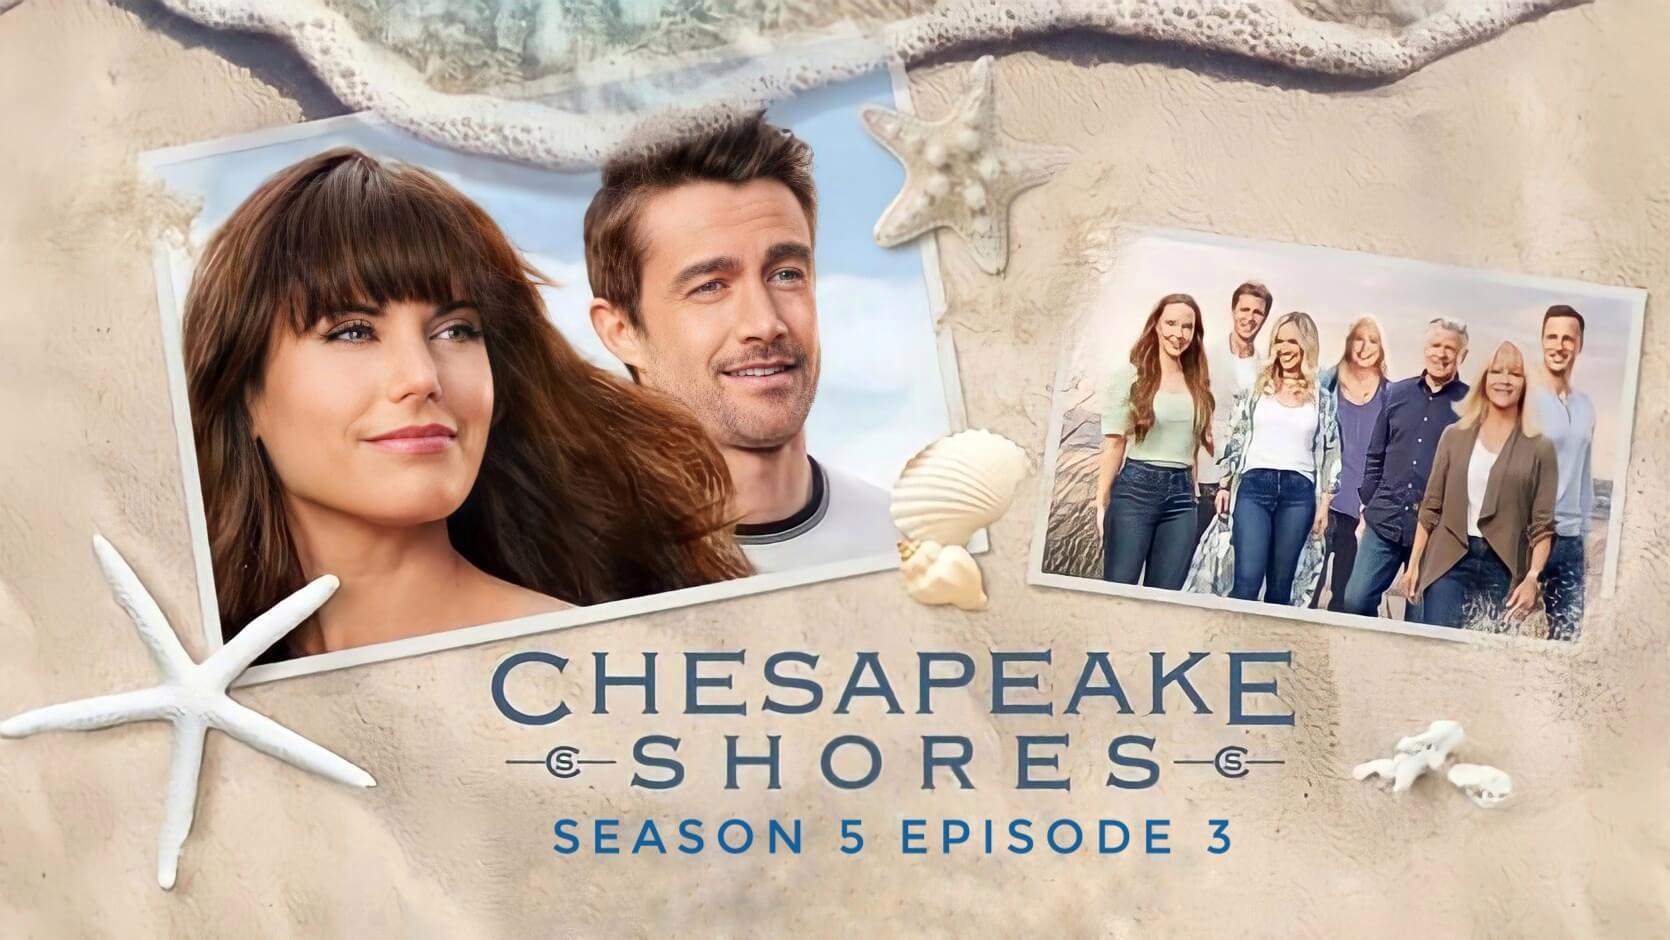 Chesapeake Shores Season 5 Episode 3 Release Date Spoiler Alert Cast And Crew